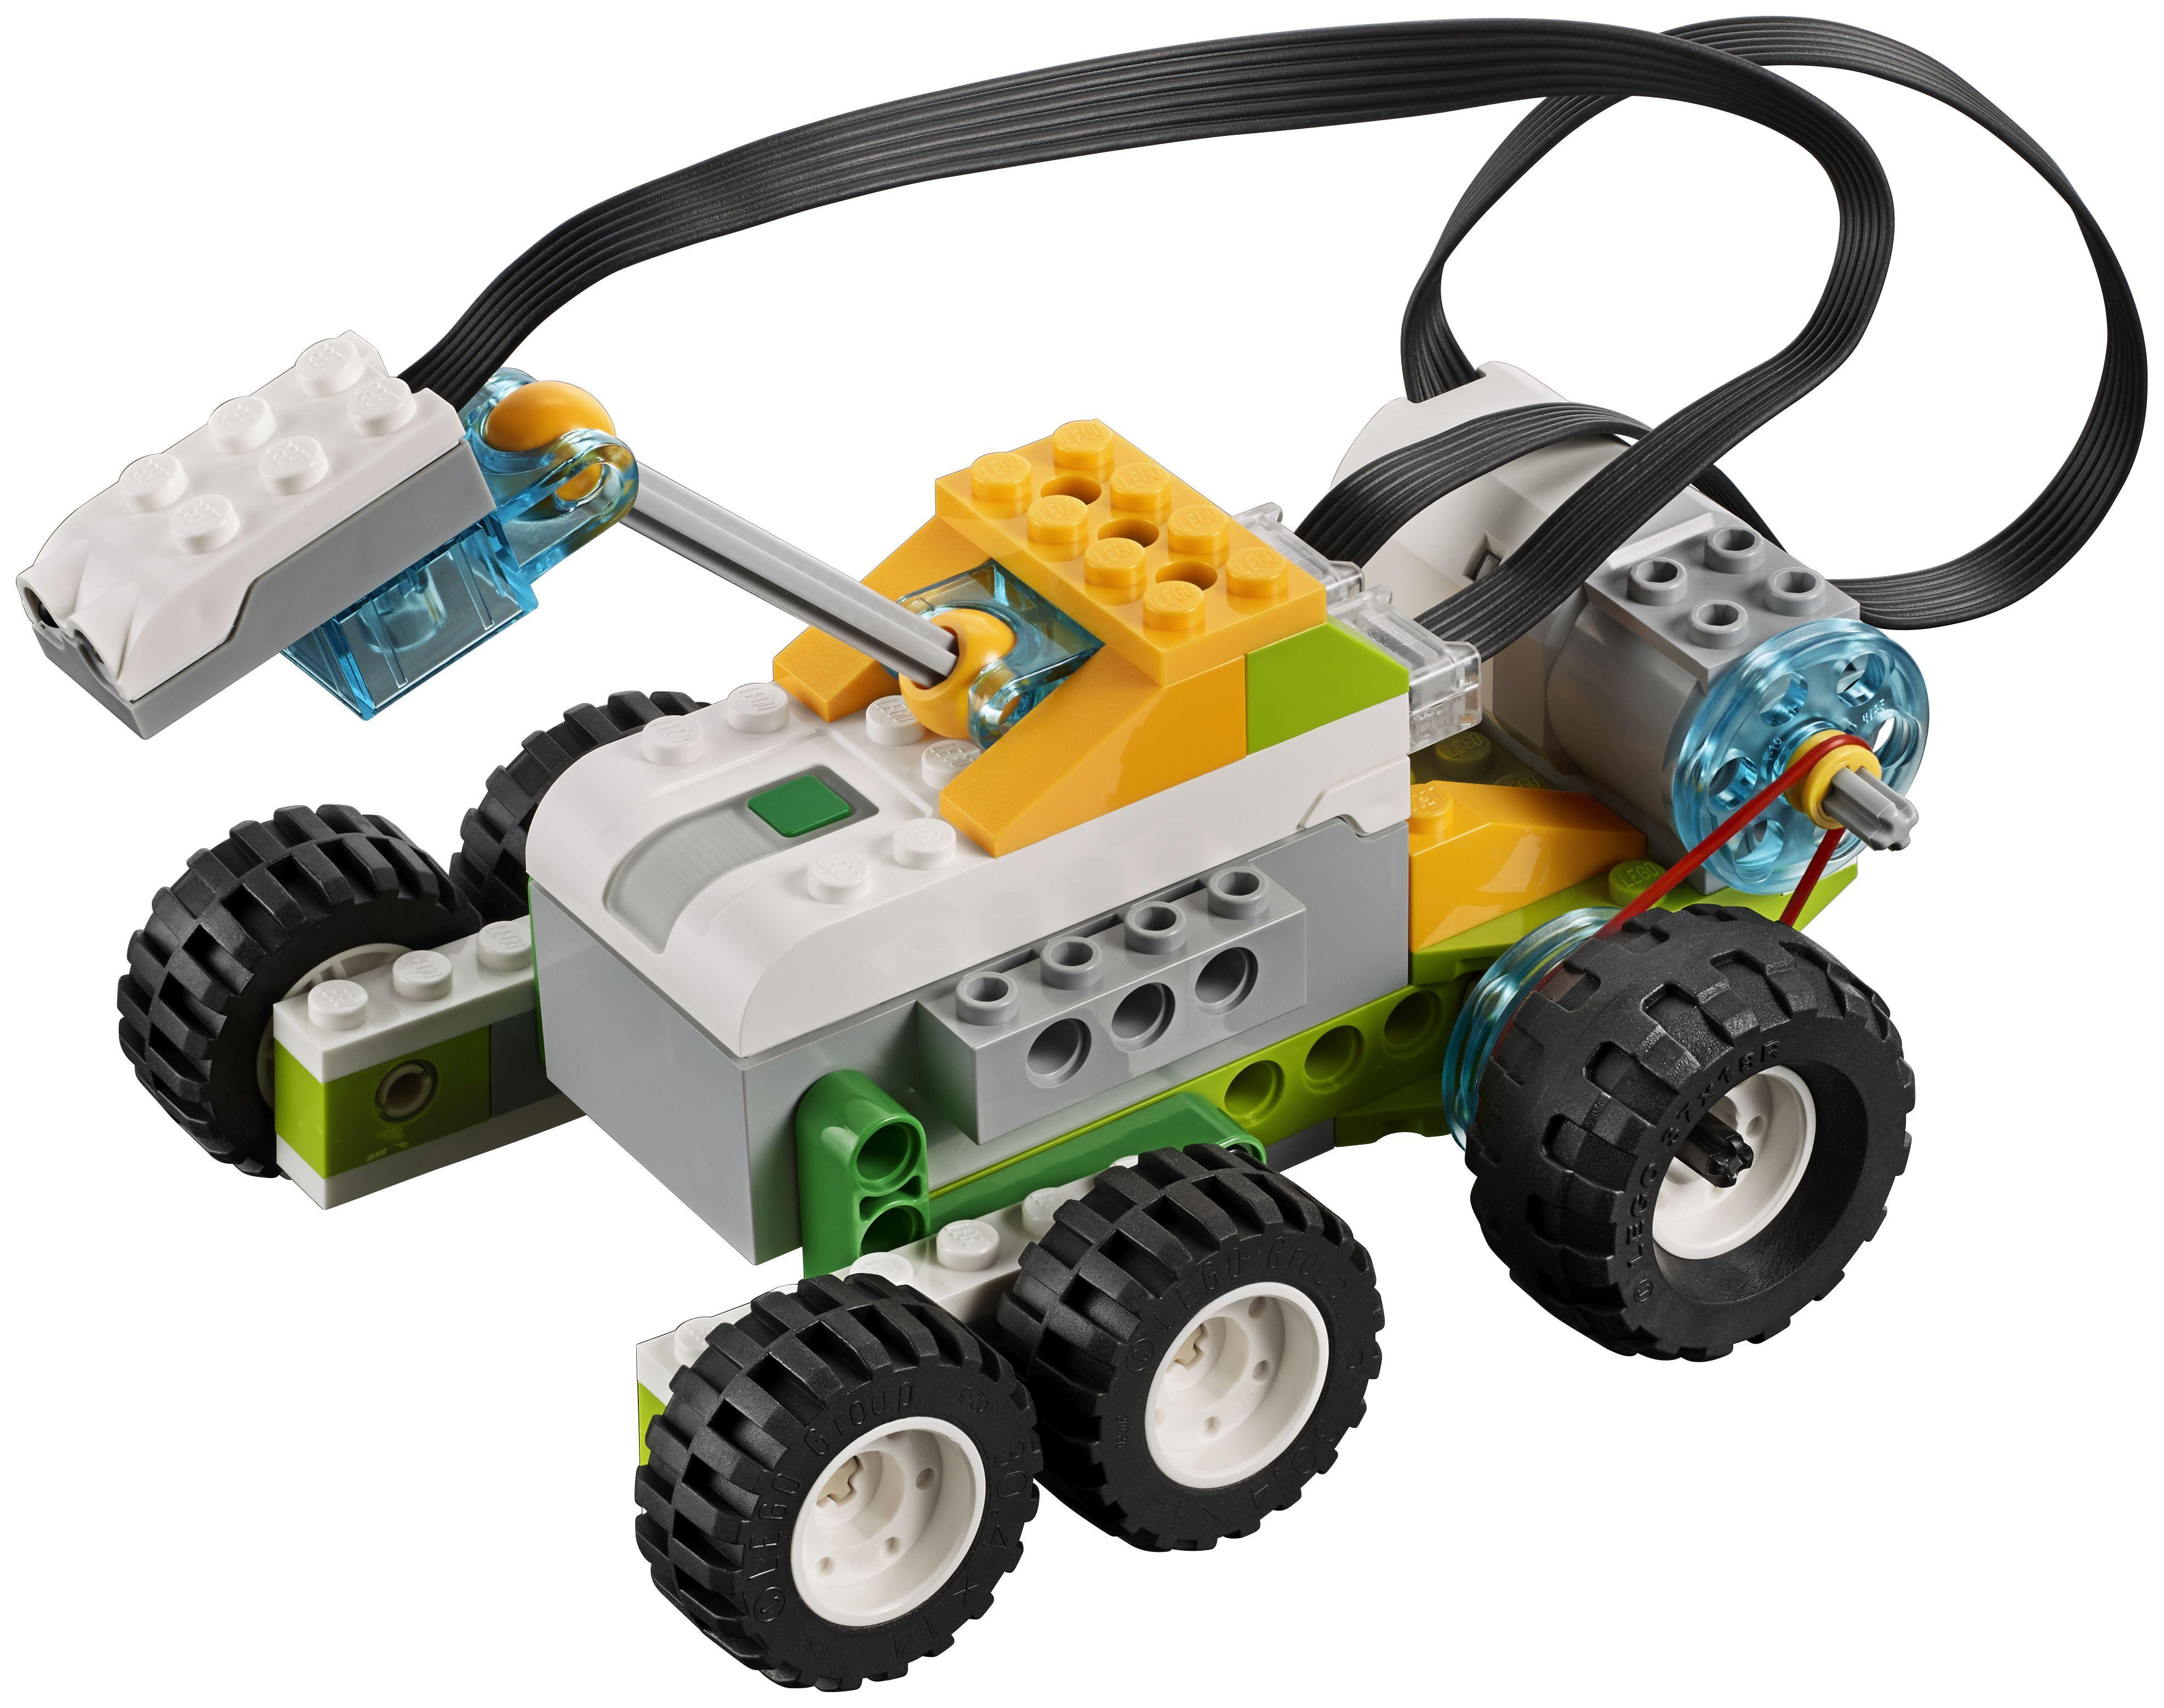 LEGO WeDo 2.0 basisset. De LEGO WeDo 2.0 basisset is een ...